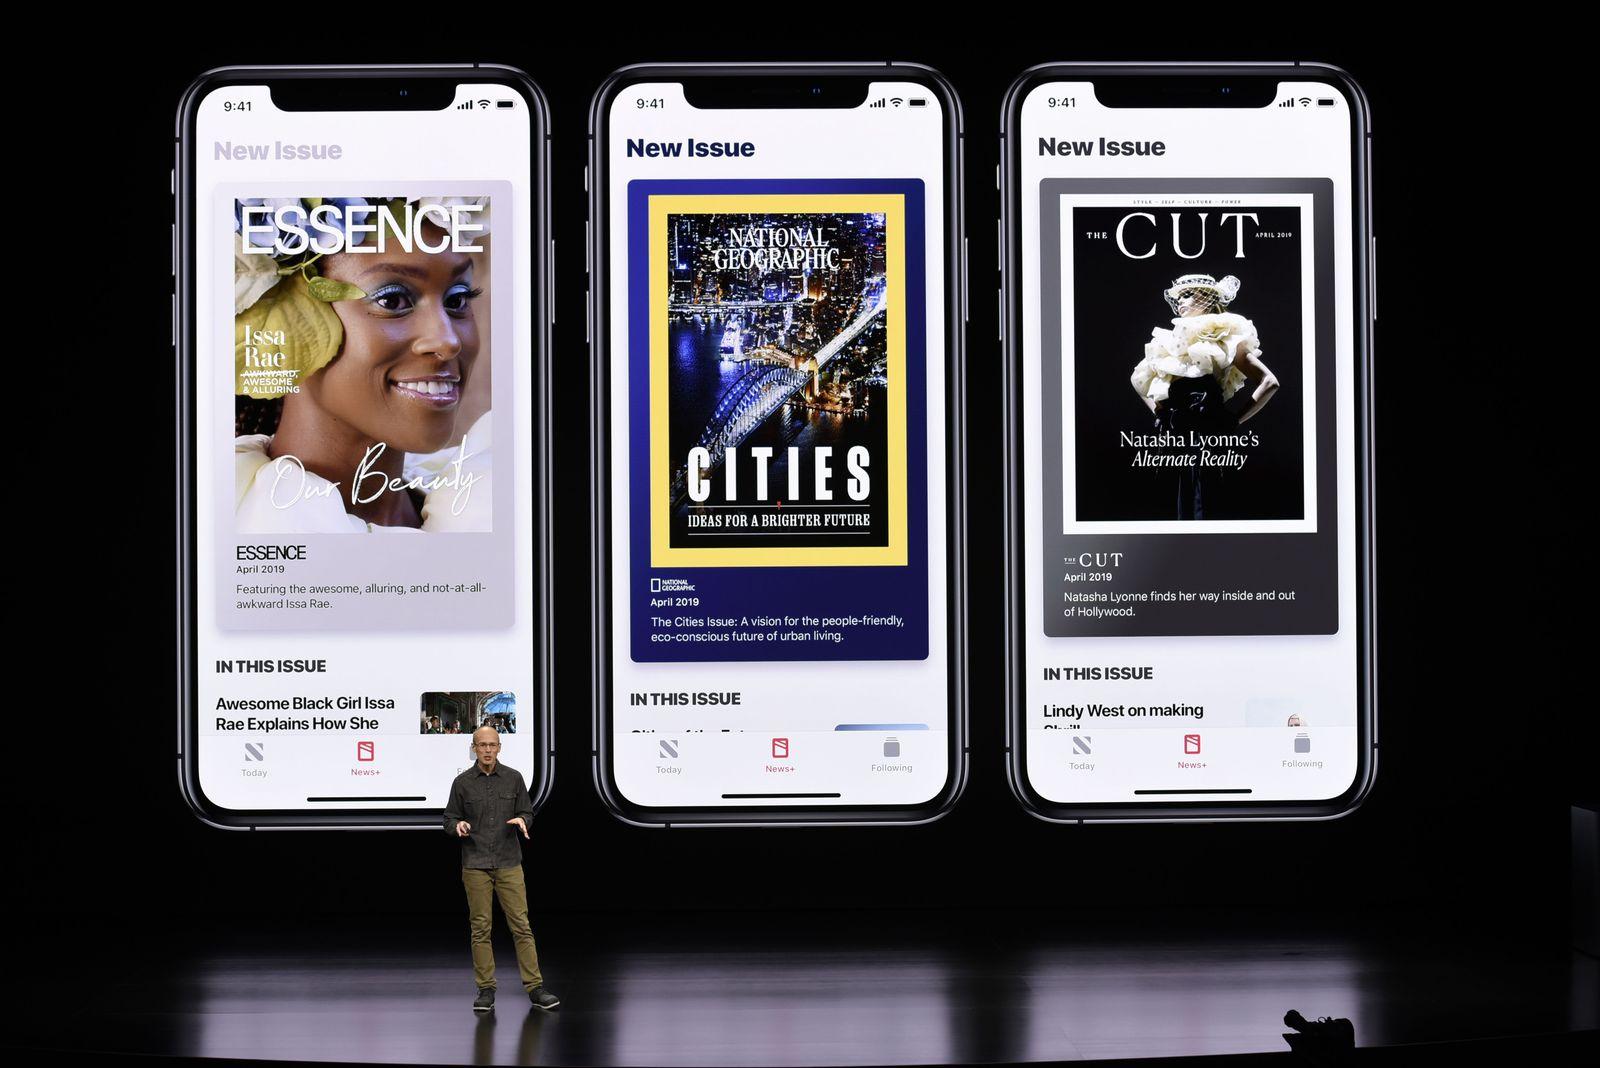 Apple/ Cupertino